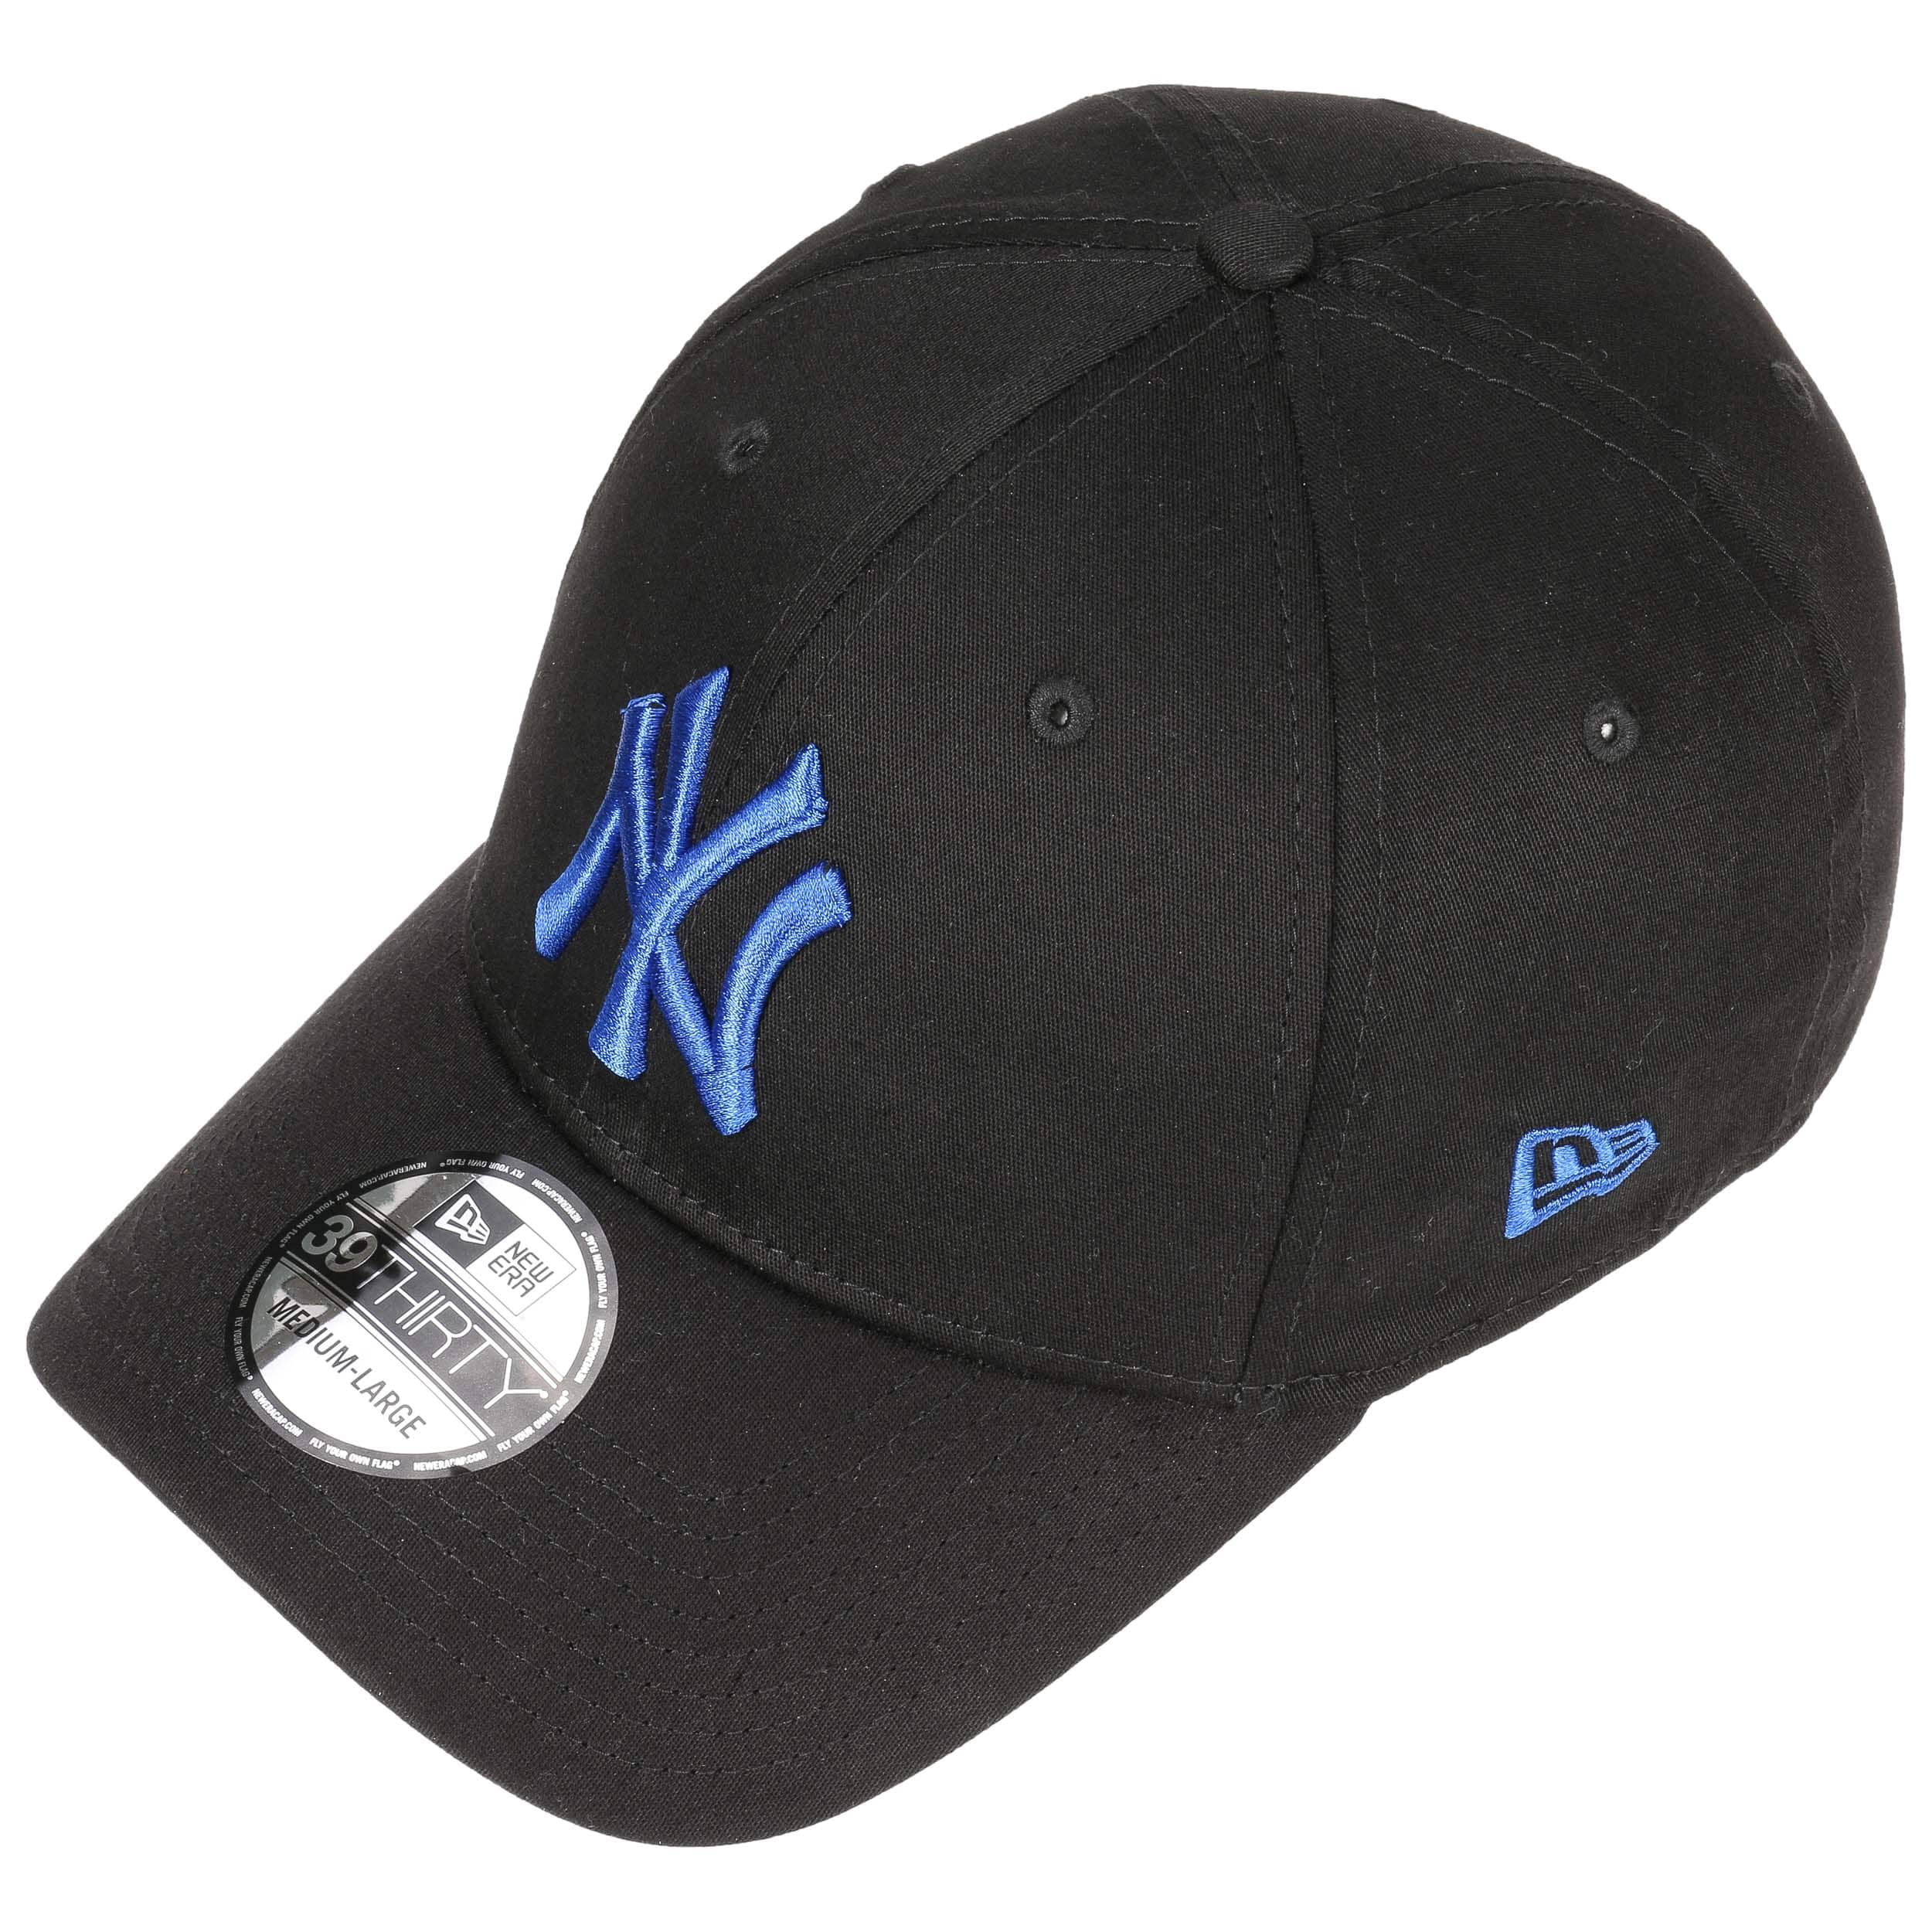 39Thirty Base Yankees Cap by New Era - Gorras - sombreroshop.es 54e1587334e